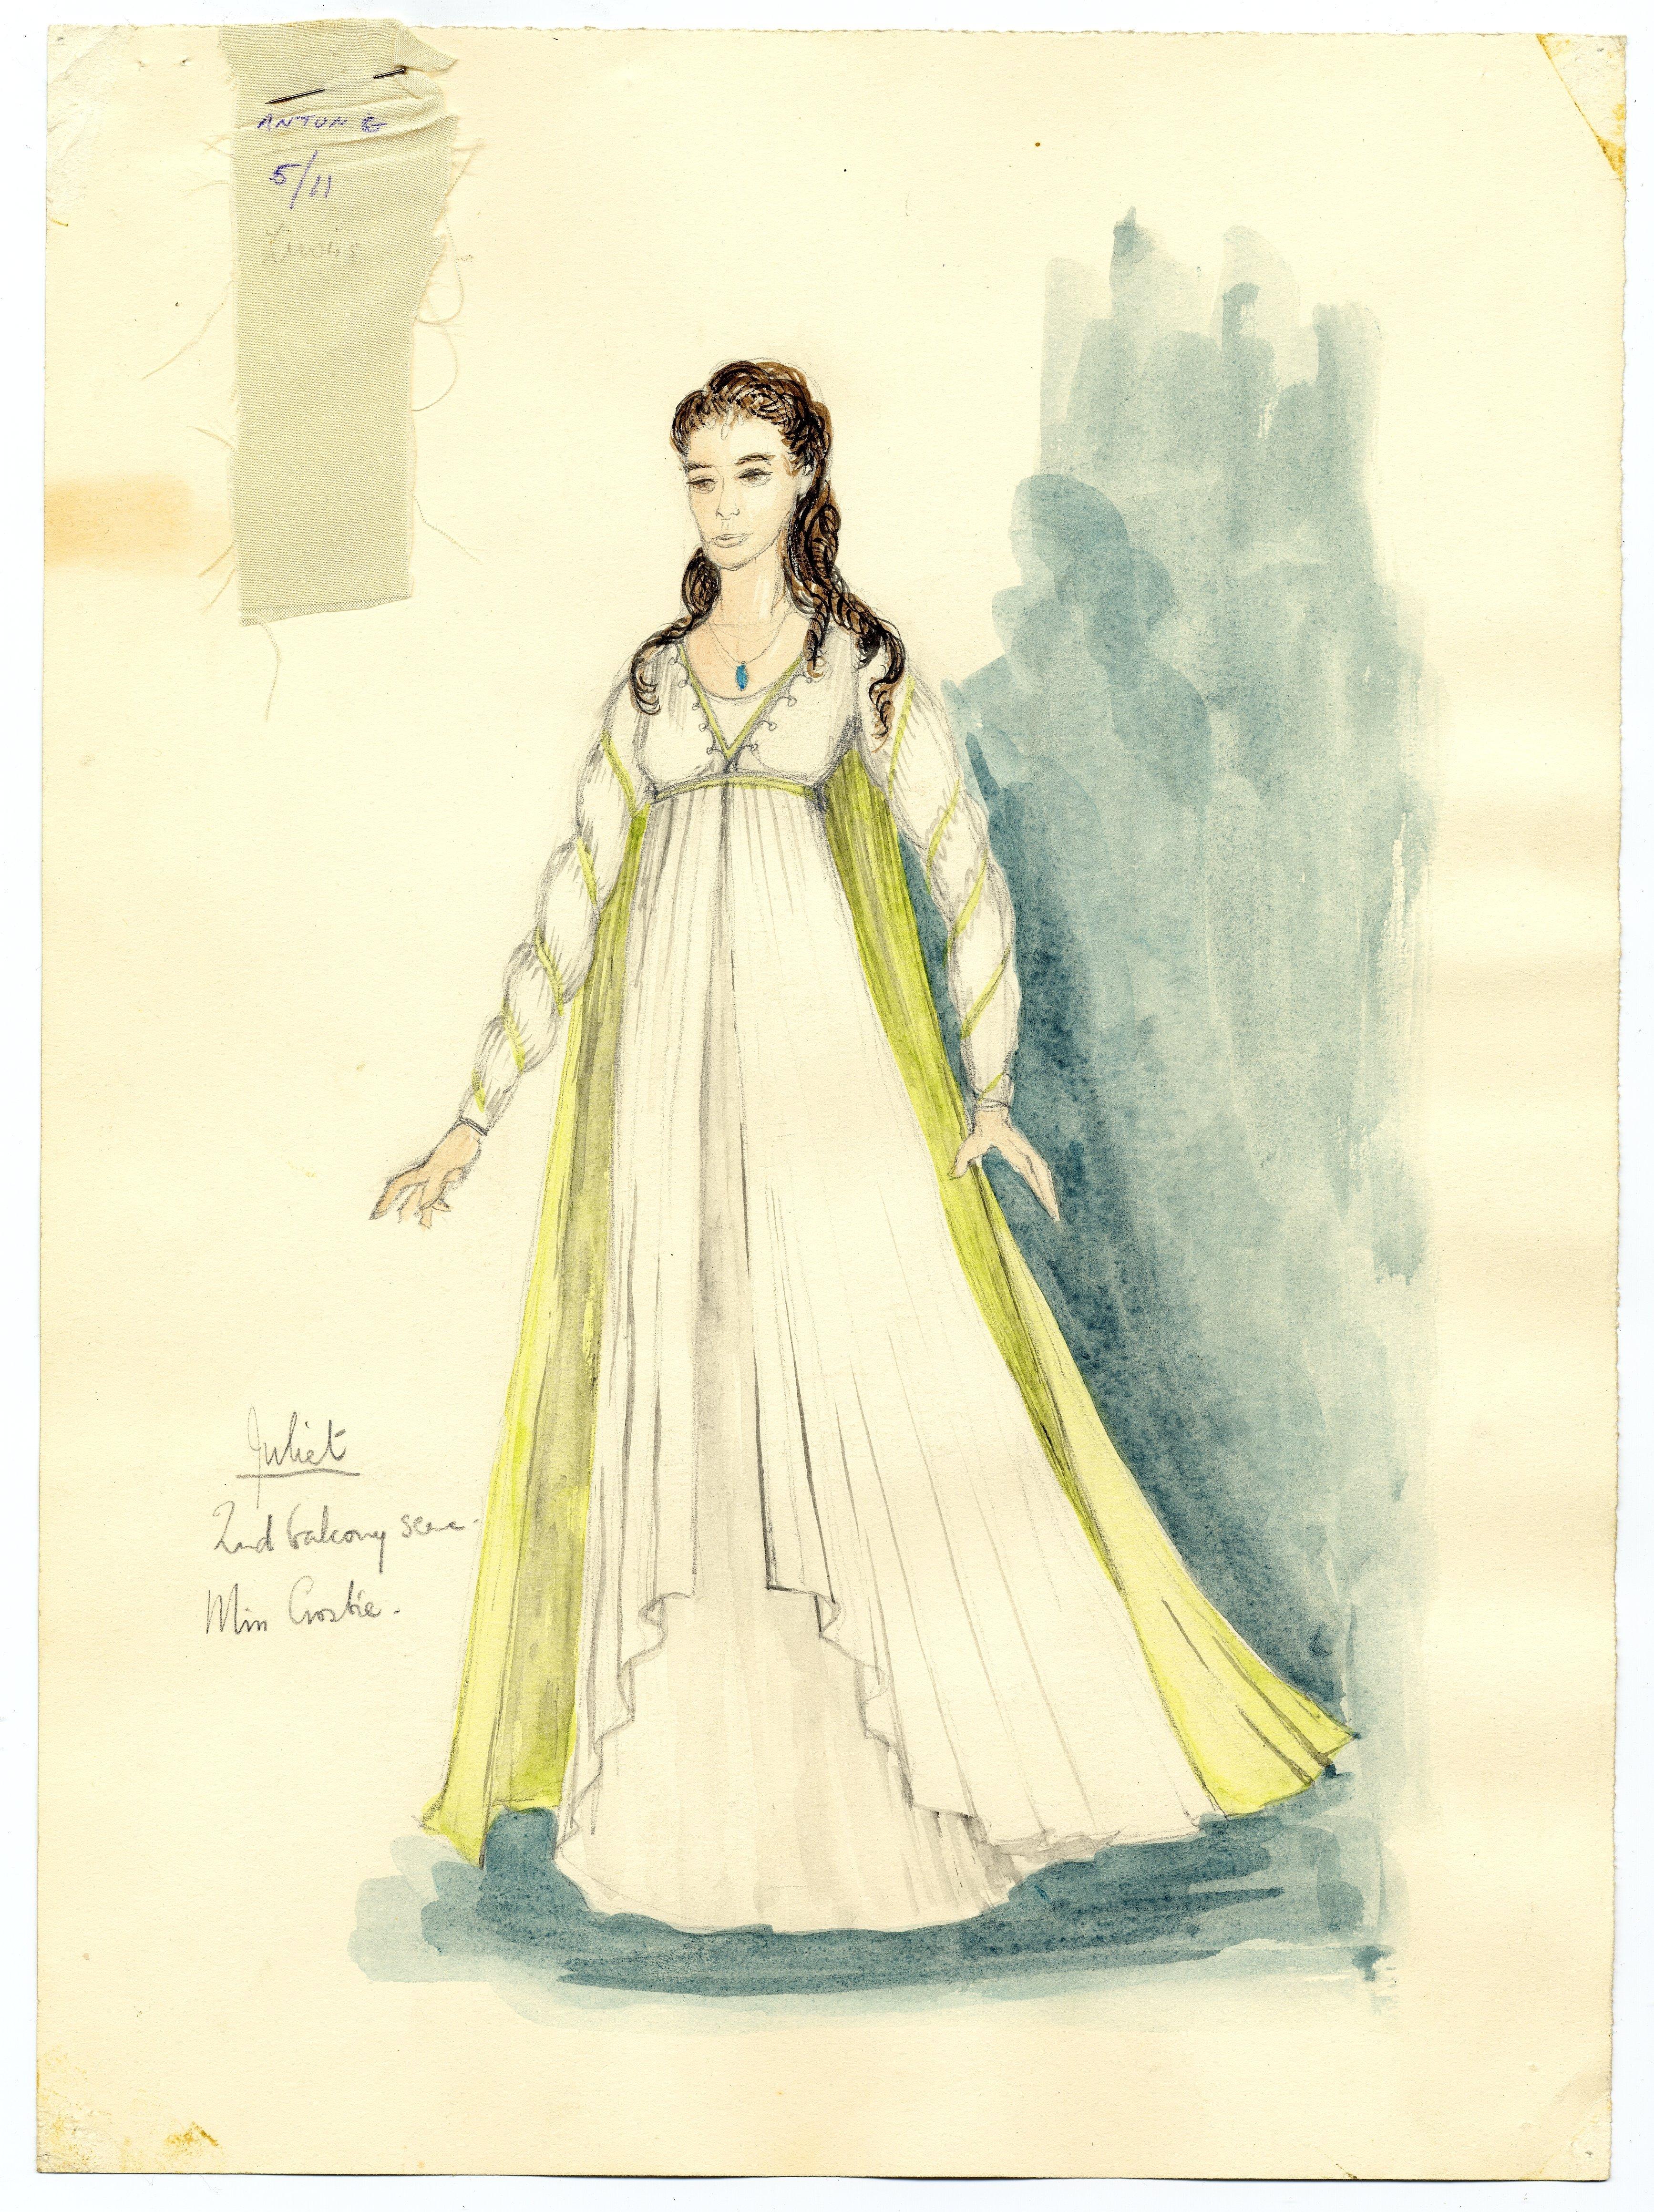 10 Fabulous Romeo And Juliet Costume Ideas daphne dare juliet costume design historical research women 2020